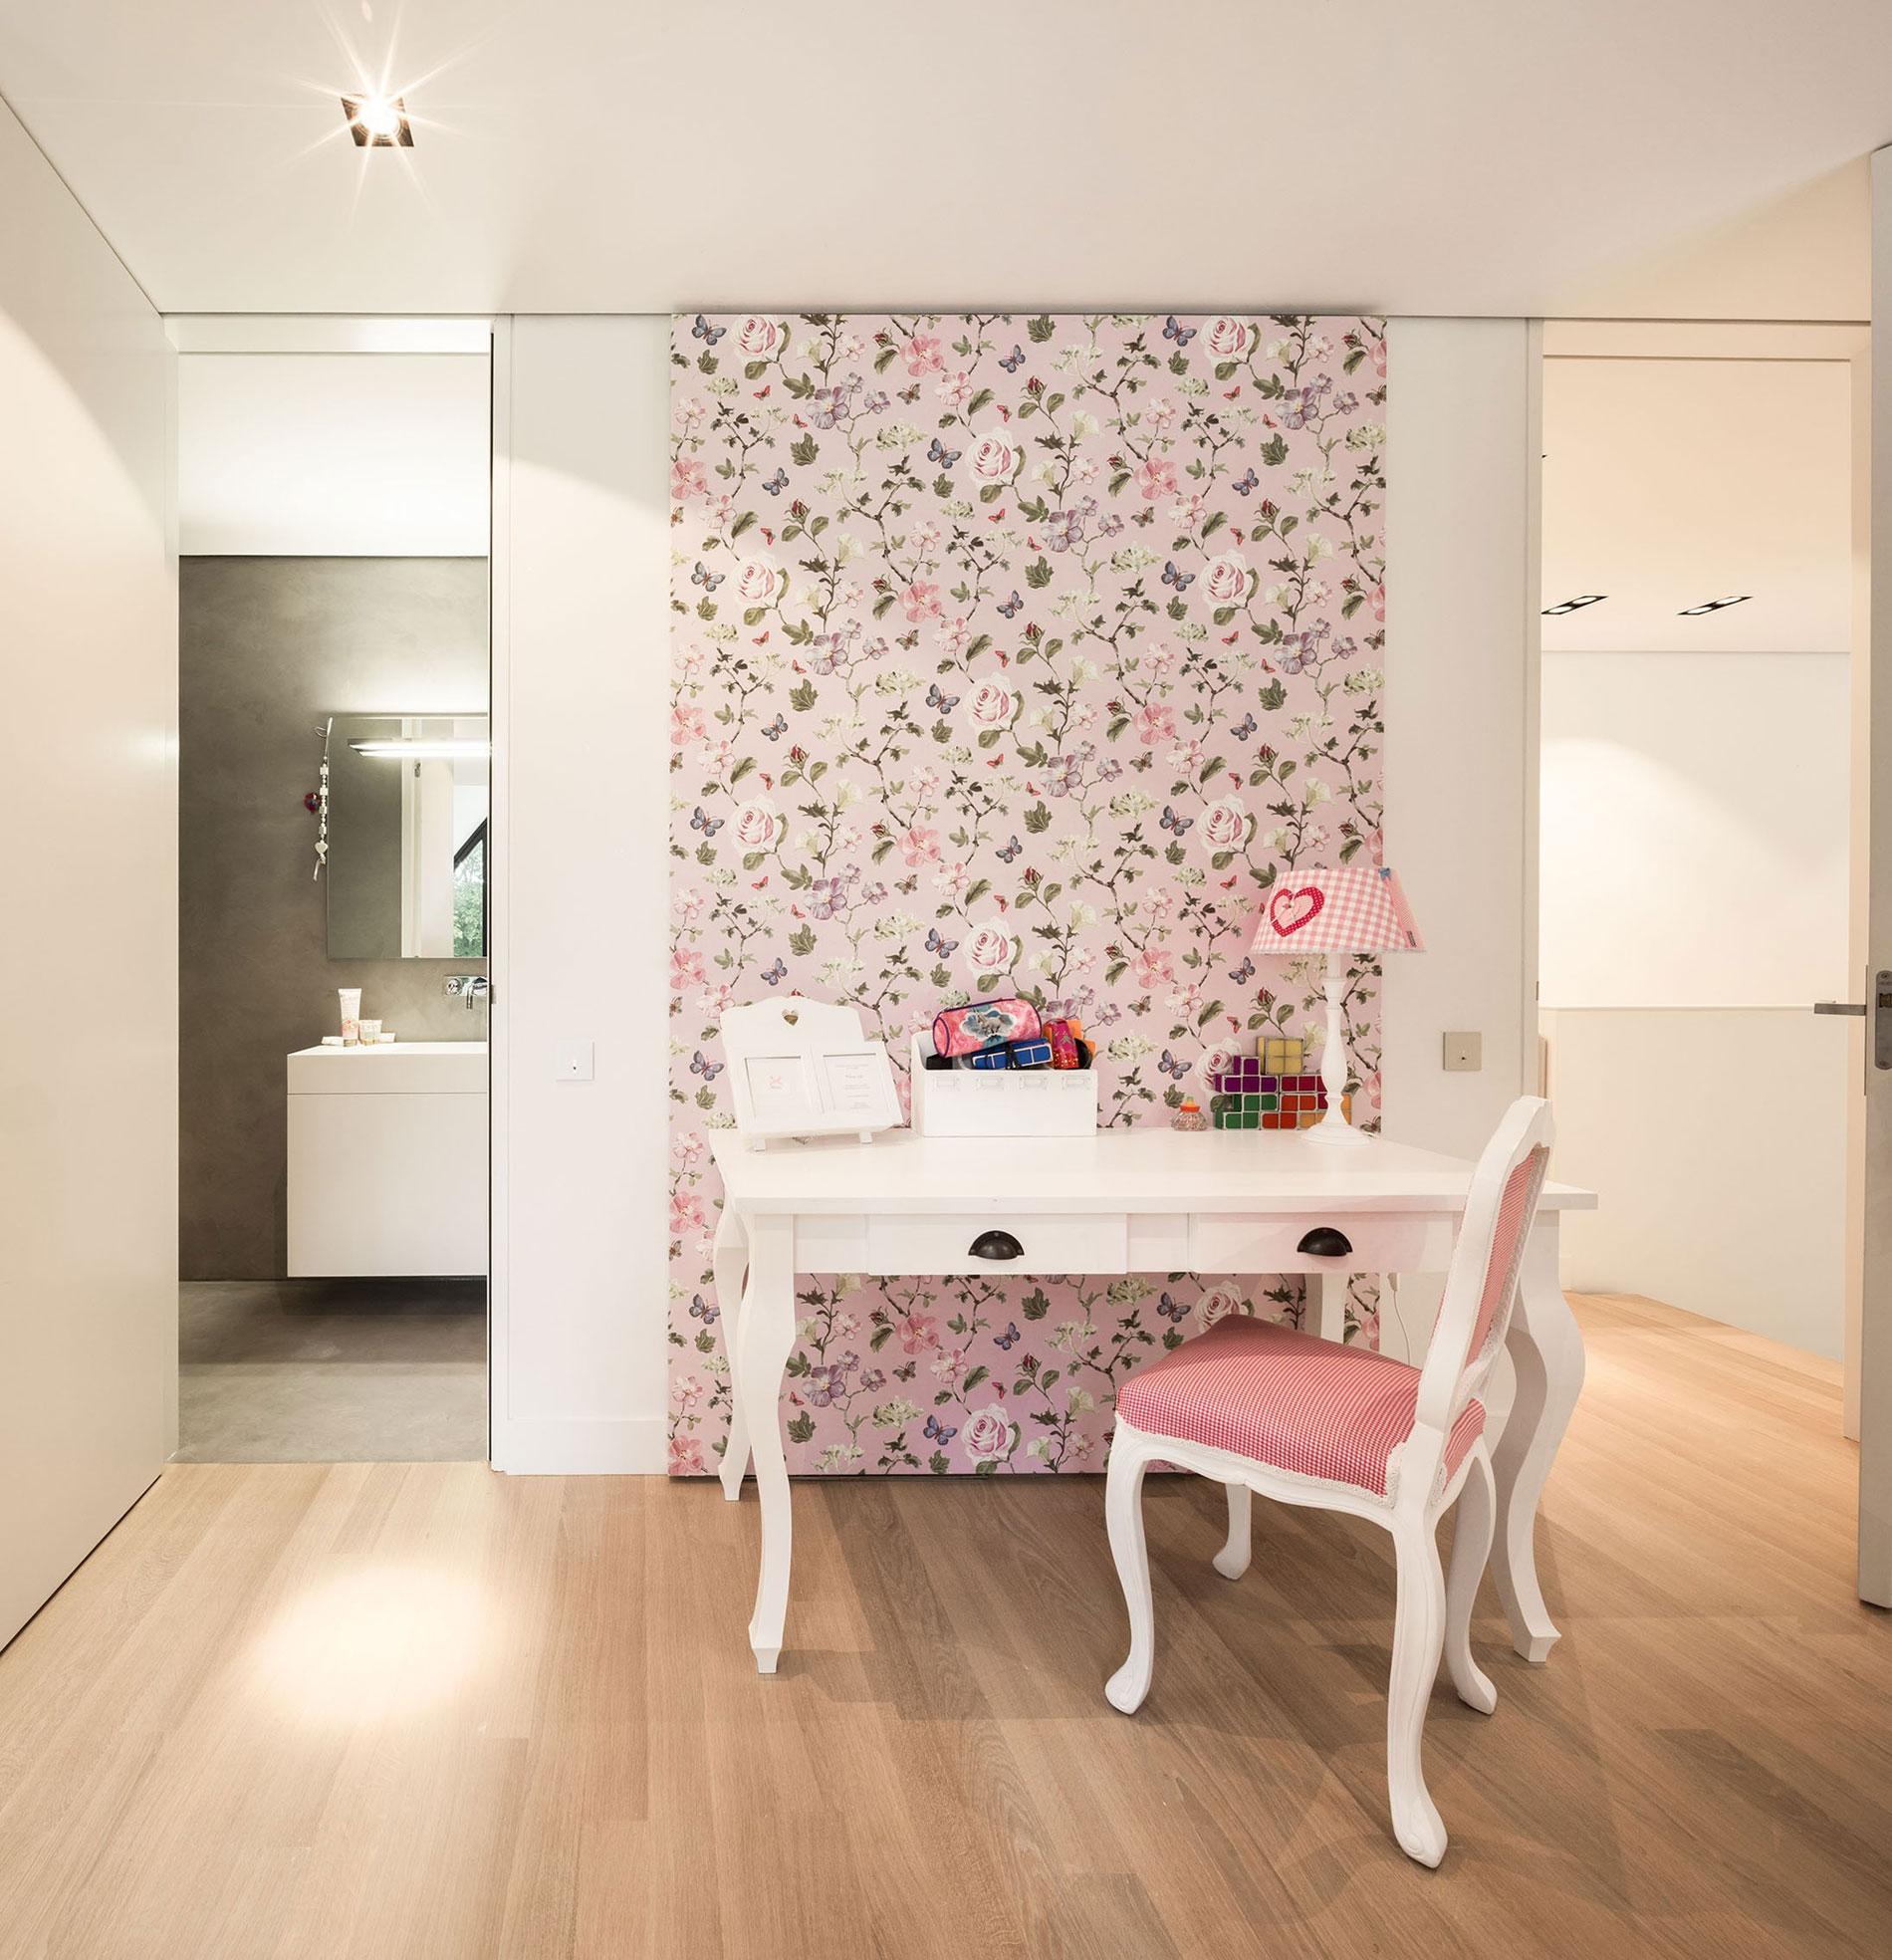 Modern Huizen Country House Located in a Quiet Rural Setting by De Brouwer Binnenwerk-18